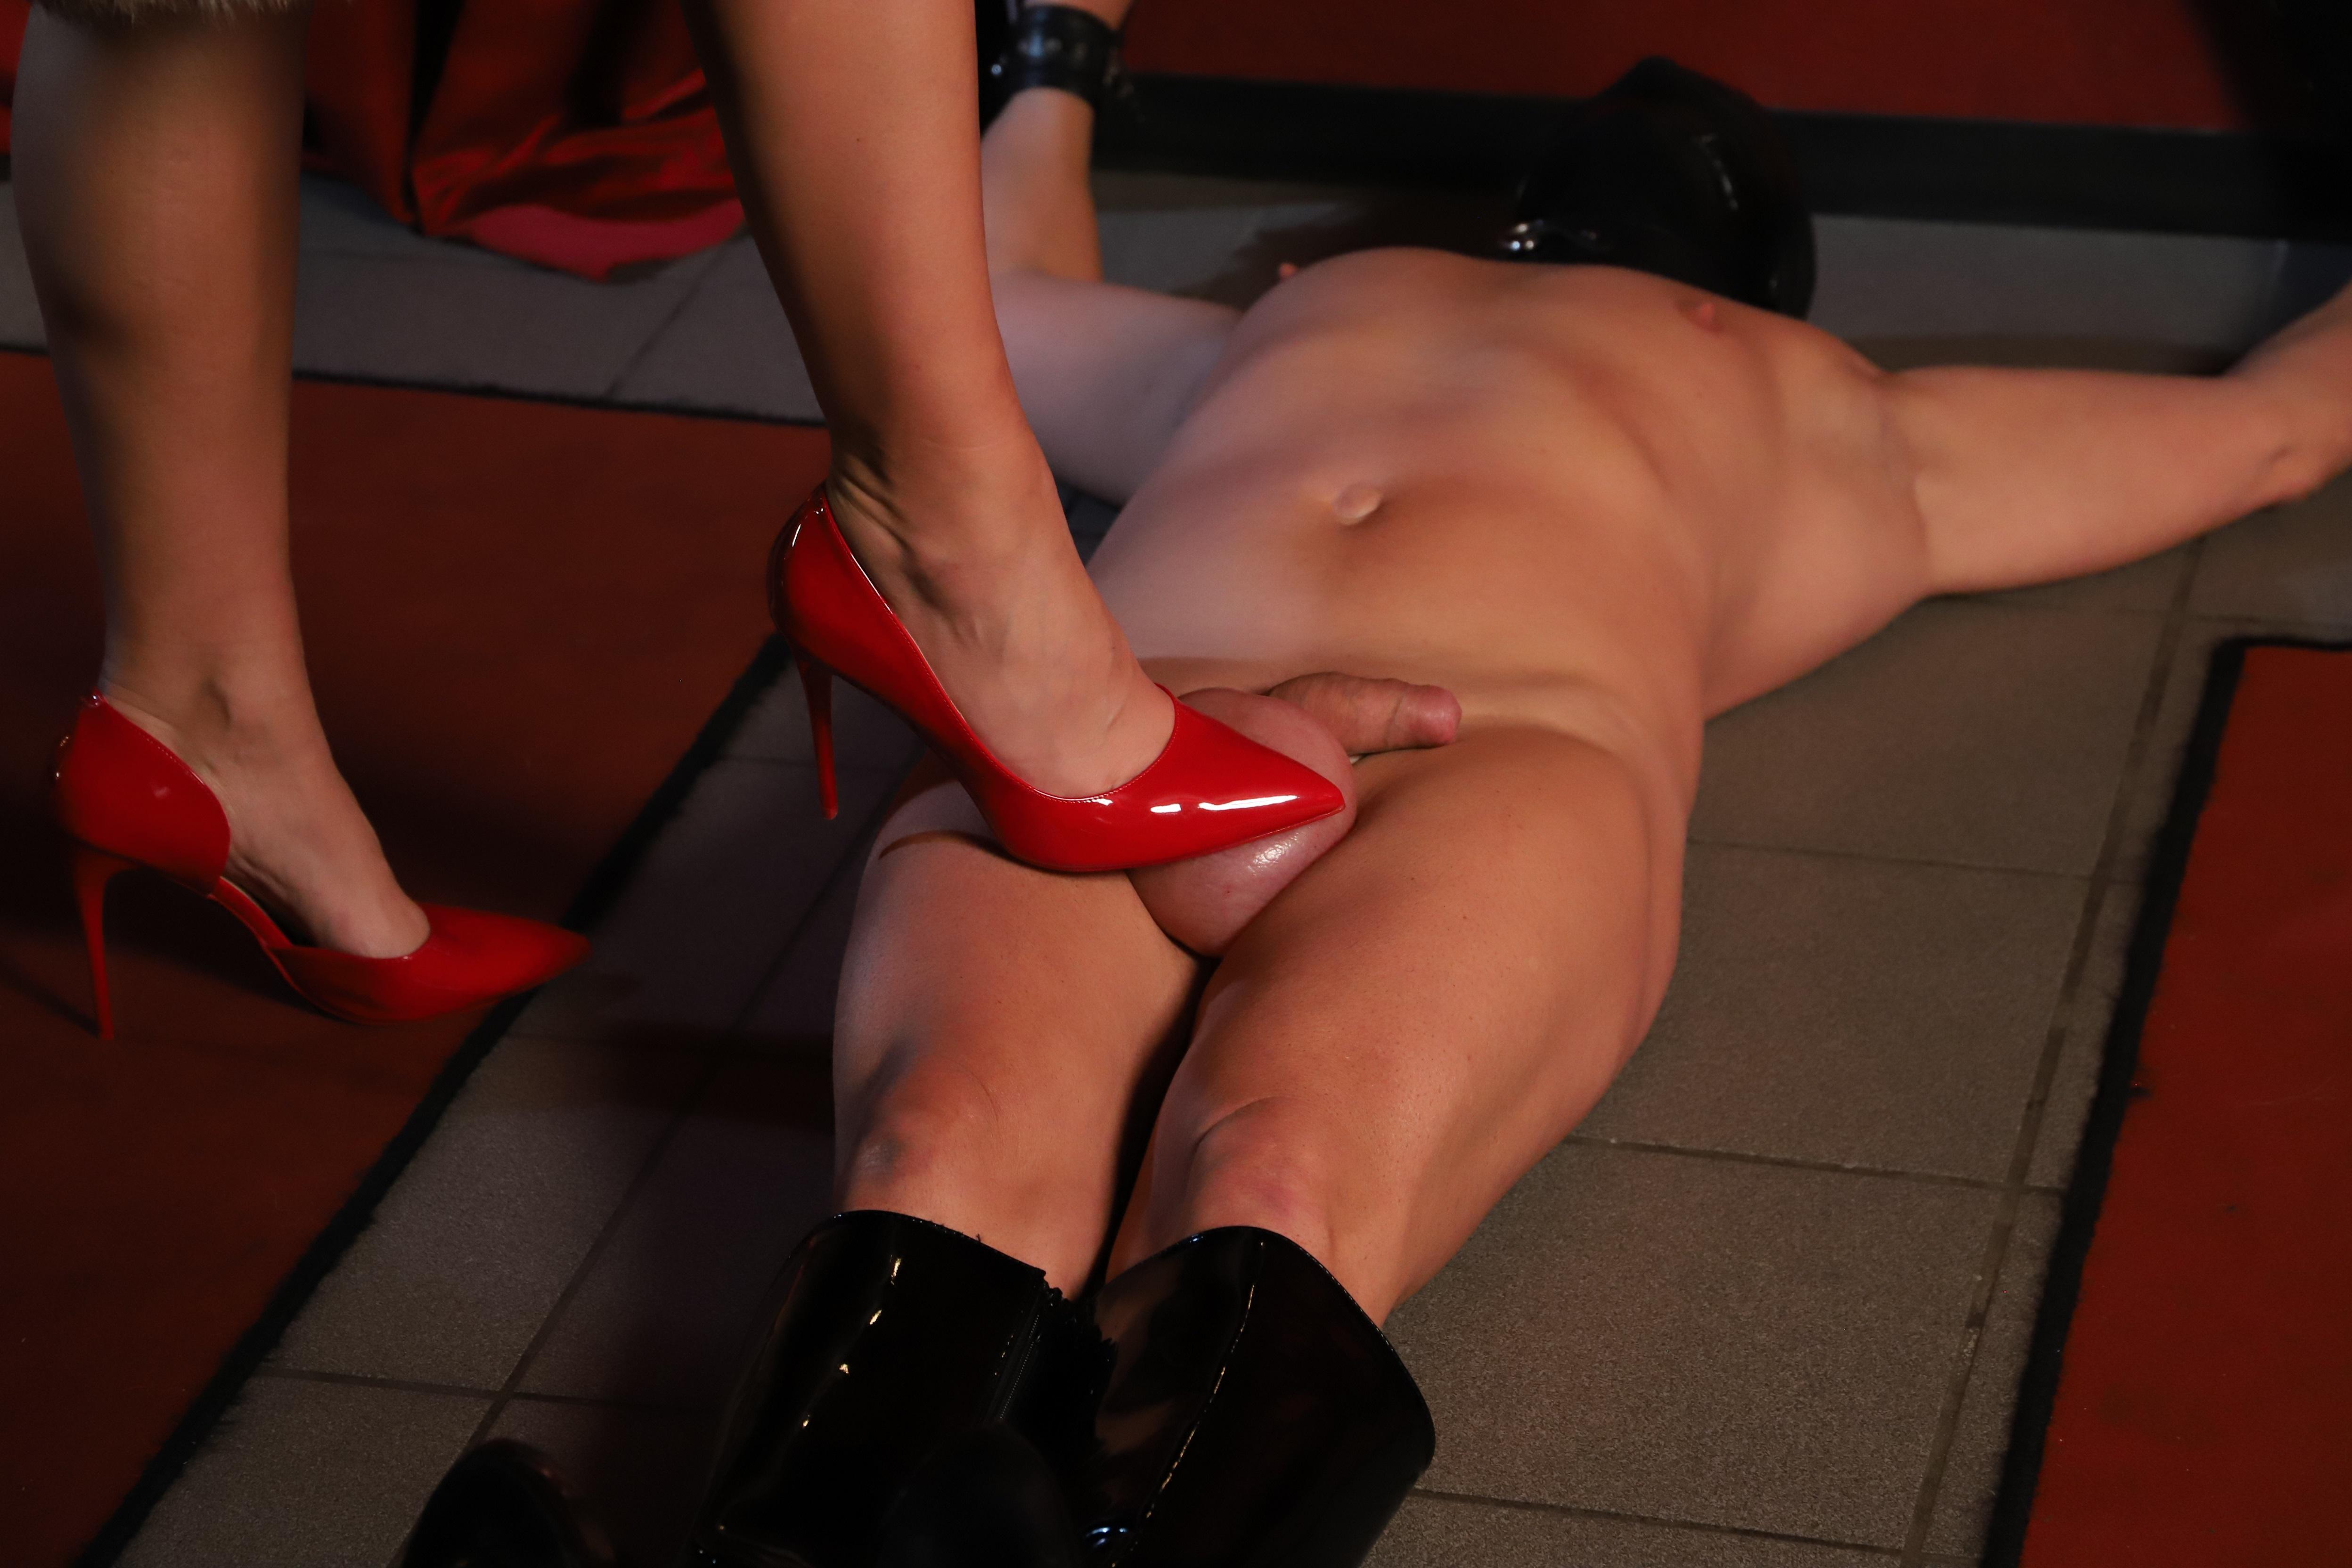 Teen showing her vagina